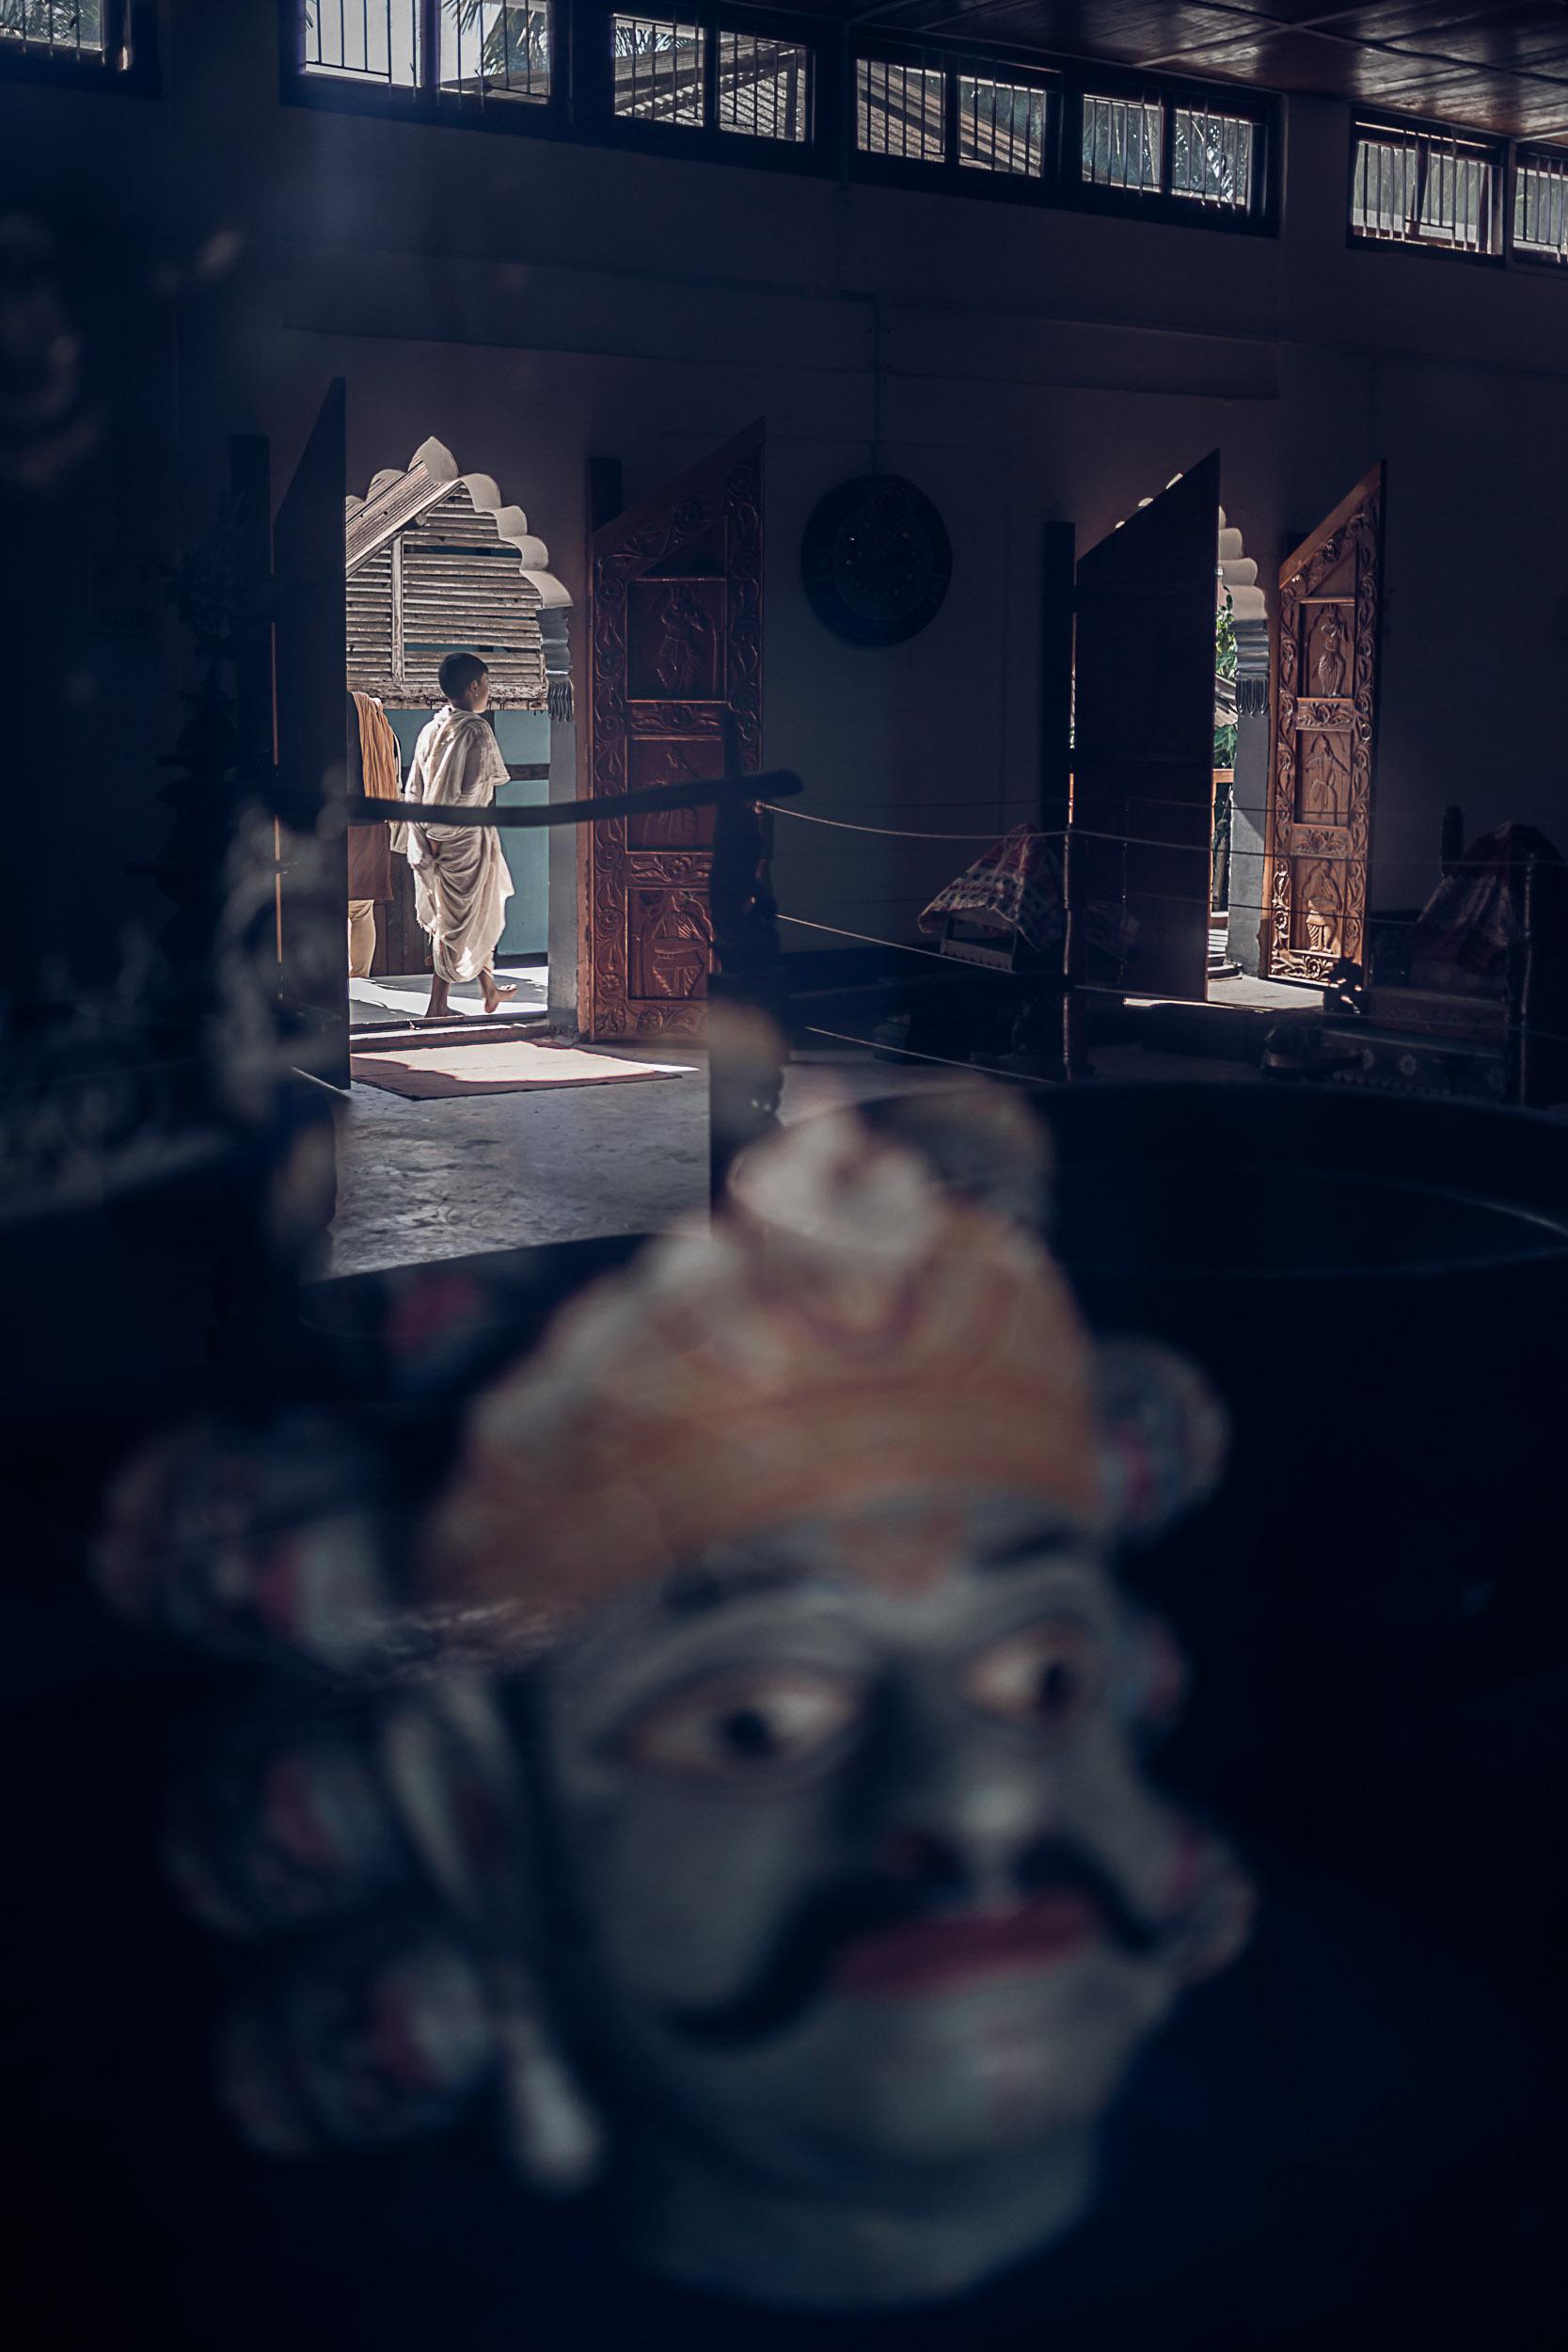 Sindhur_Photography_Travel_People_Majuli-19.JPG